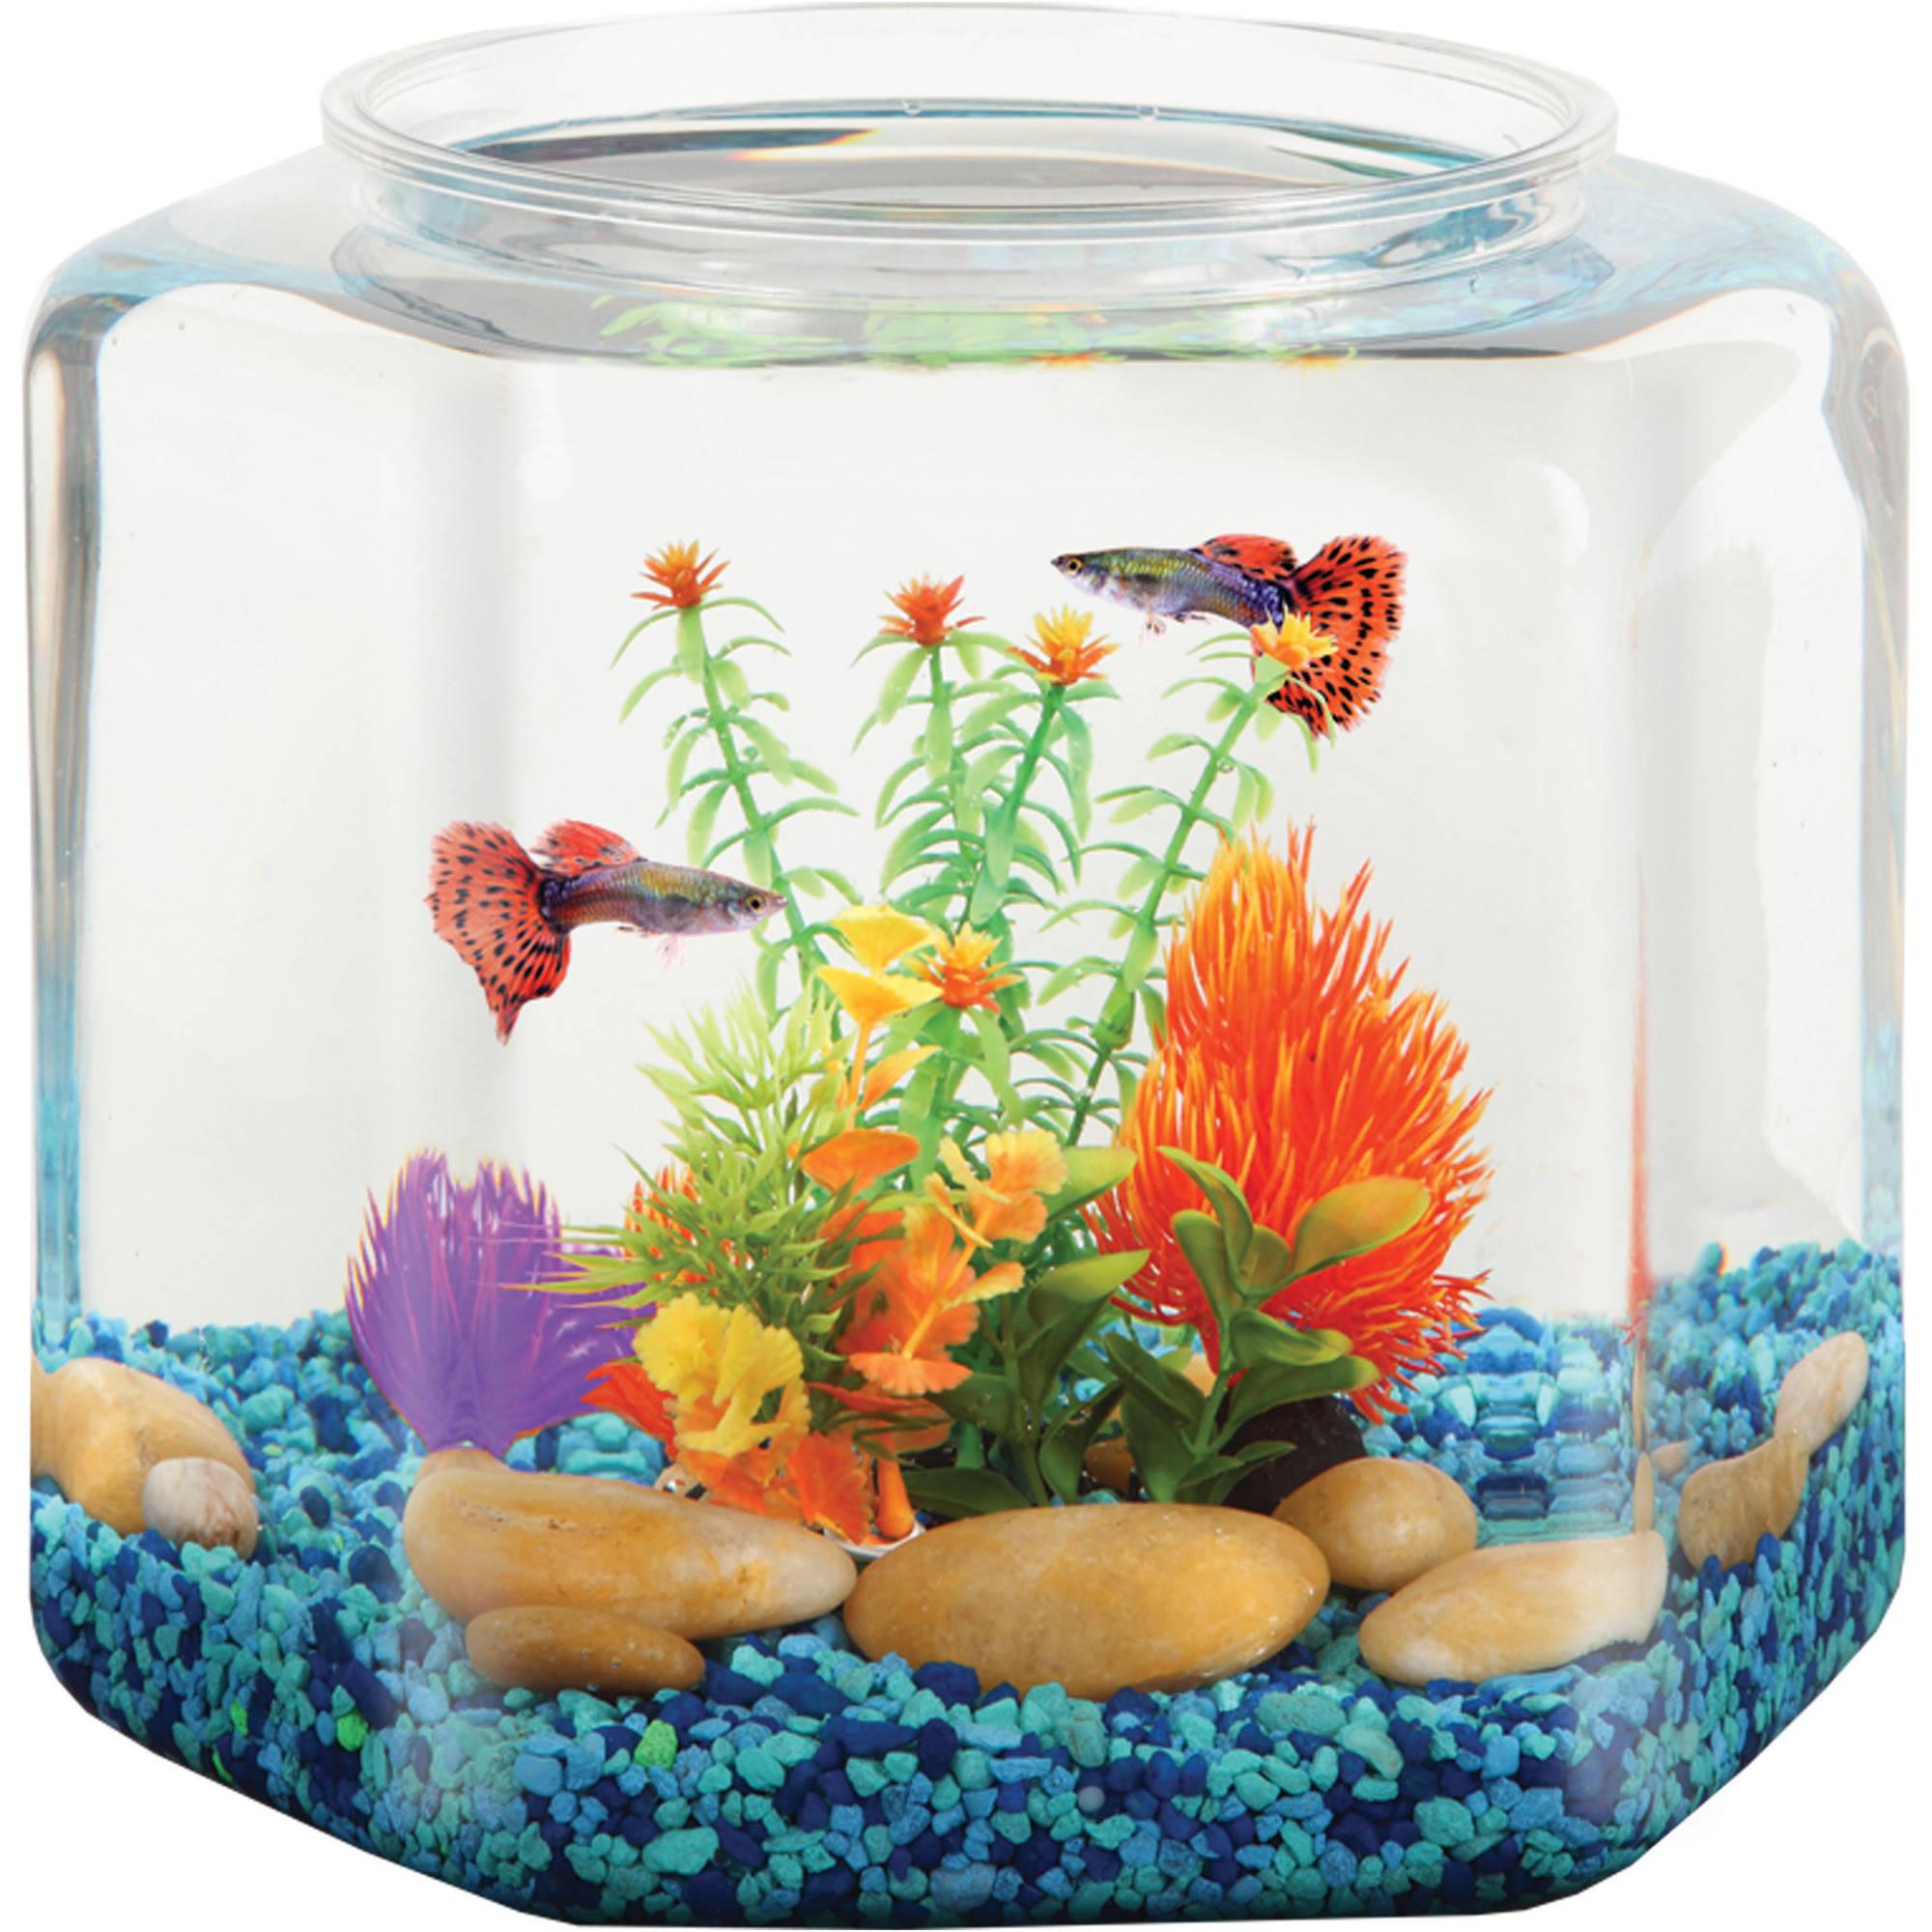 Hawkeye 2-Gallon Hexagon Fish Bowl